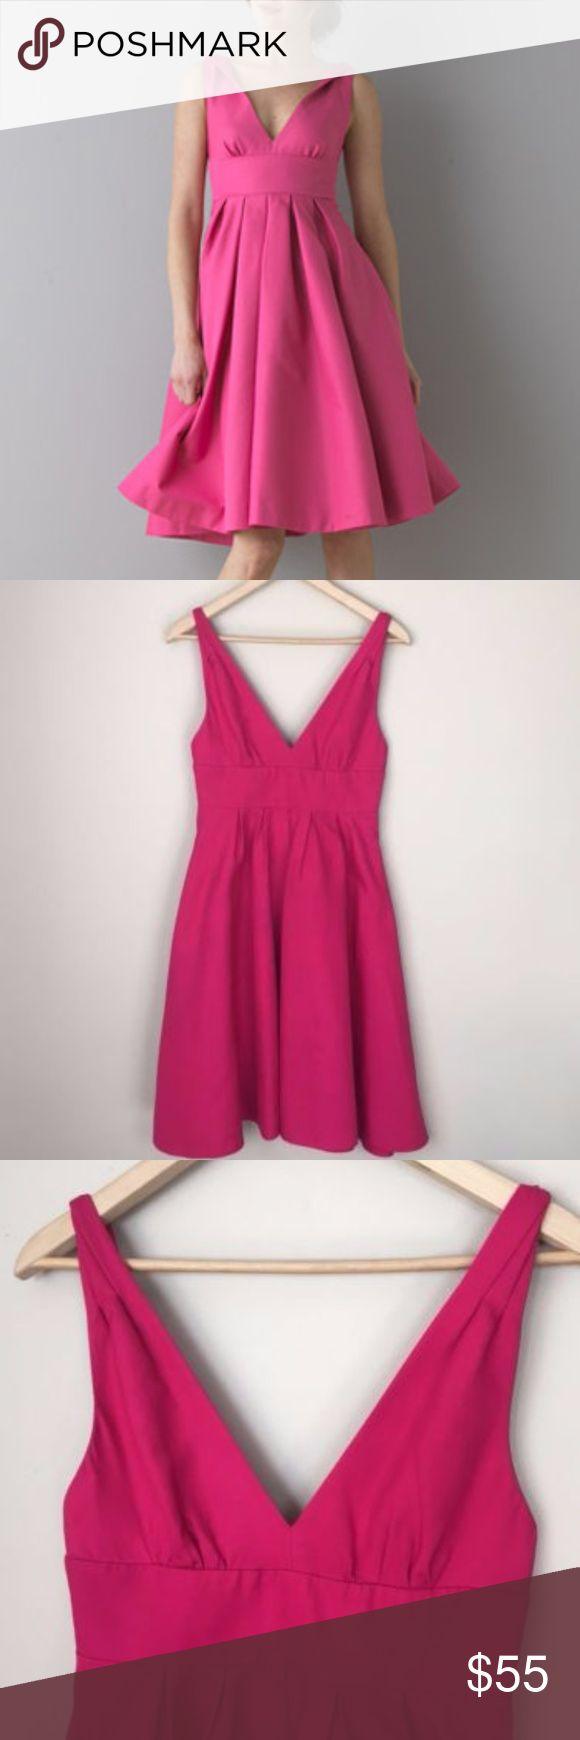 "J.Crew pink empire waist a line Janey dress Women's J.Crew pink empire waist a line Janey dress size 2 #86683 ($275) So pretty! A dark pink, almost magenta colored dress. V neck. Empire waist. A line. Lined. Zipper in back.  Bust: 15"" across Waist: 13.5"" across Length: 38"" J. Crew Dresses Midi"